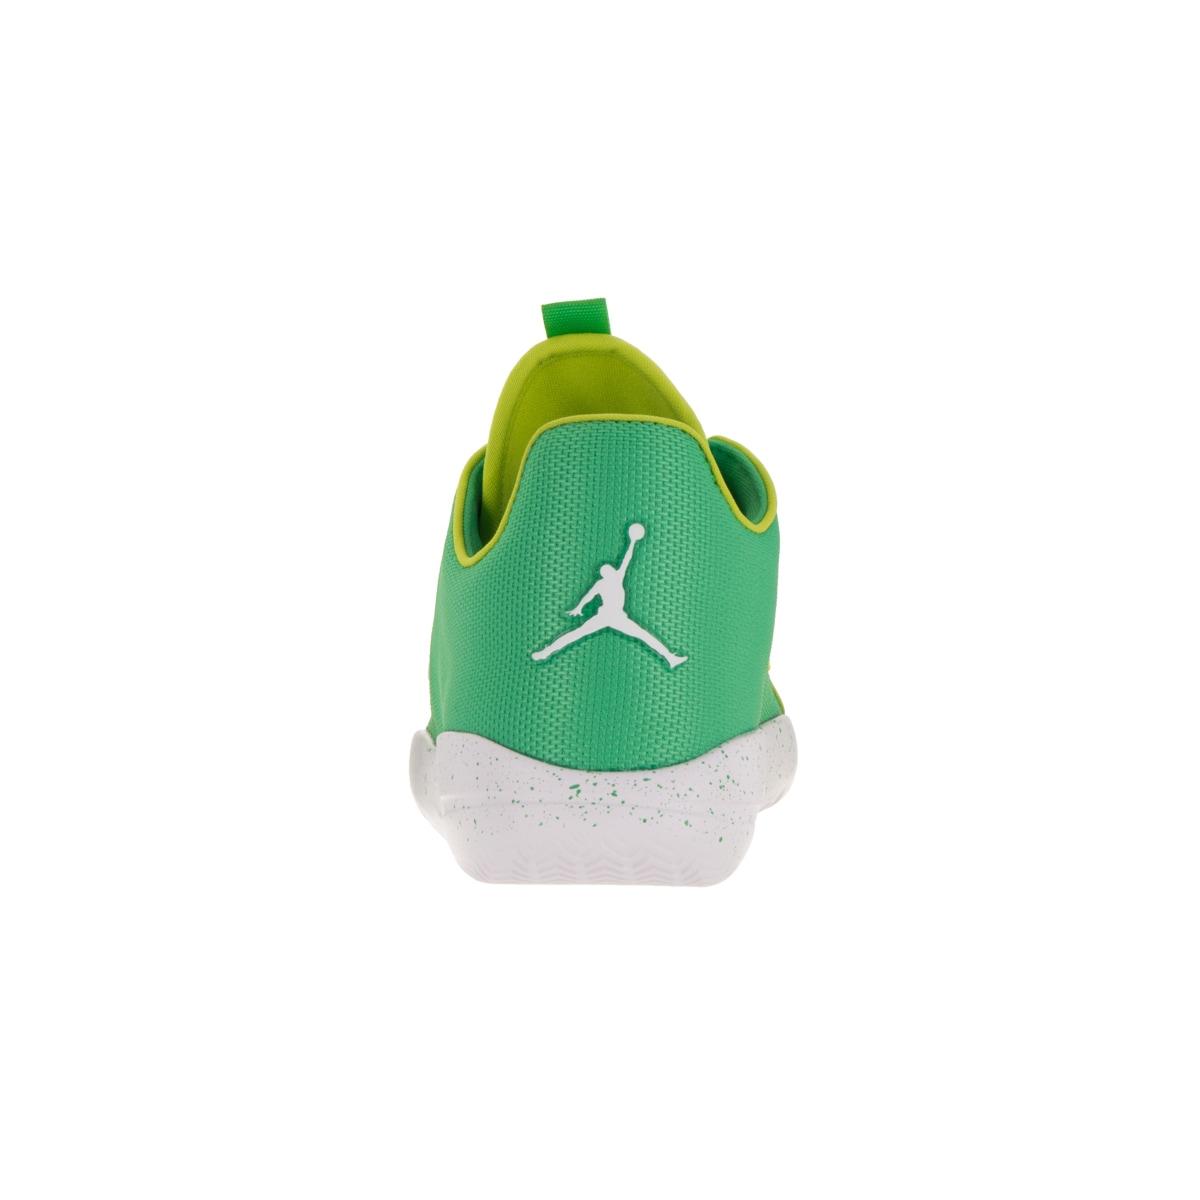 Shop Nike Jordan Kids  Jordan Eclipse Gamma Green and Cyber White Synthetic  Running Shoes - Free Shipping Today - Overstock.com - 13404619 83362a16bafa